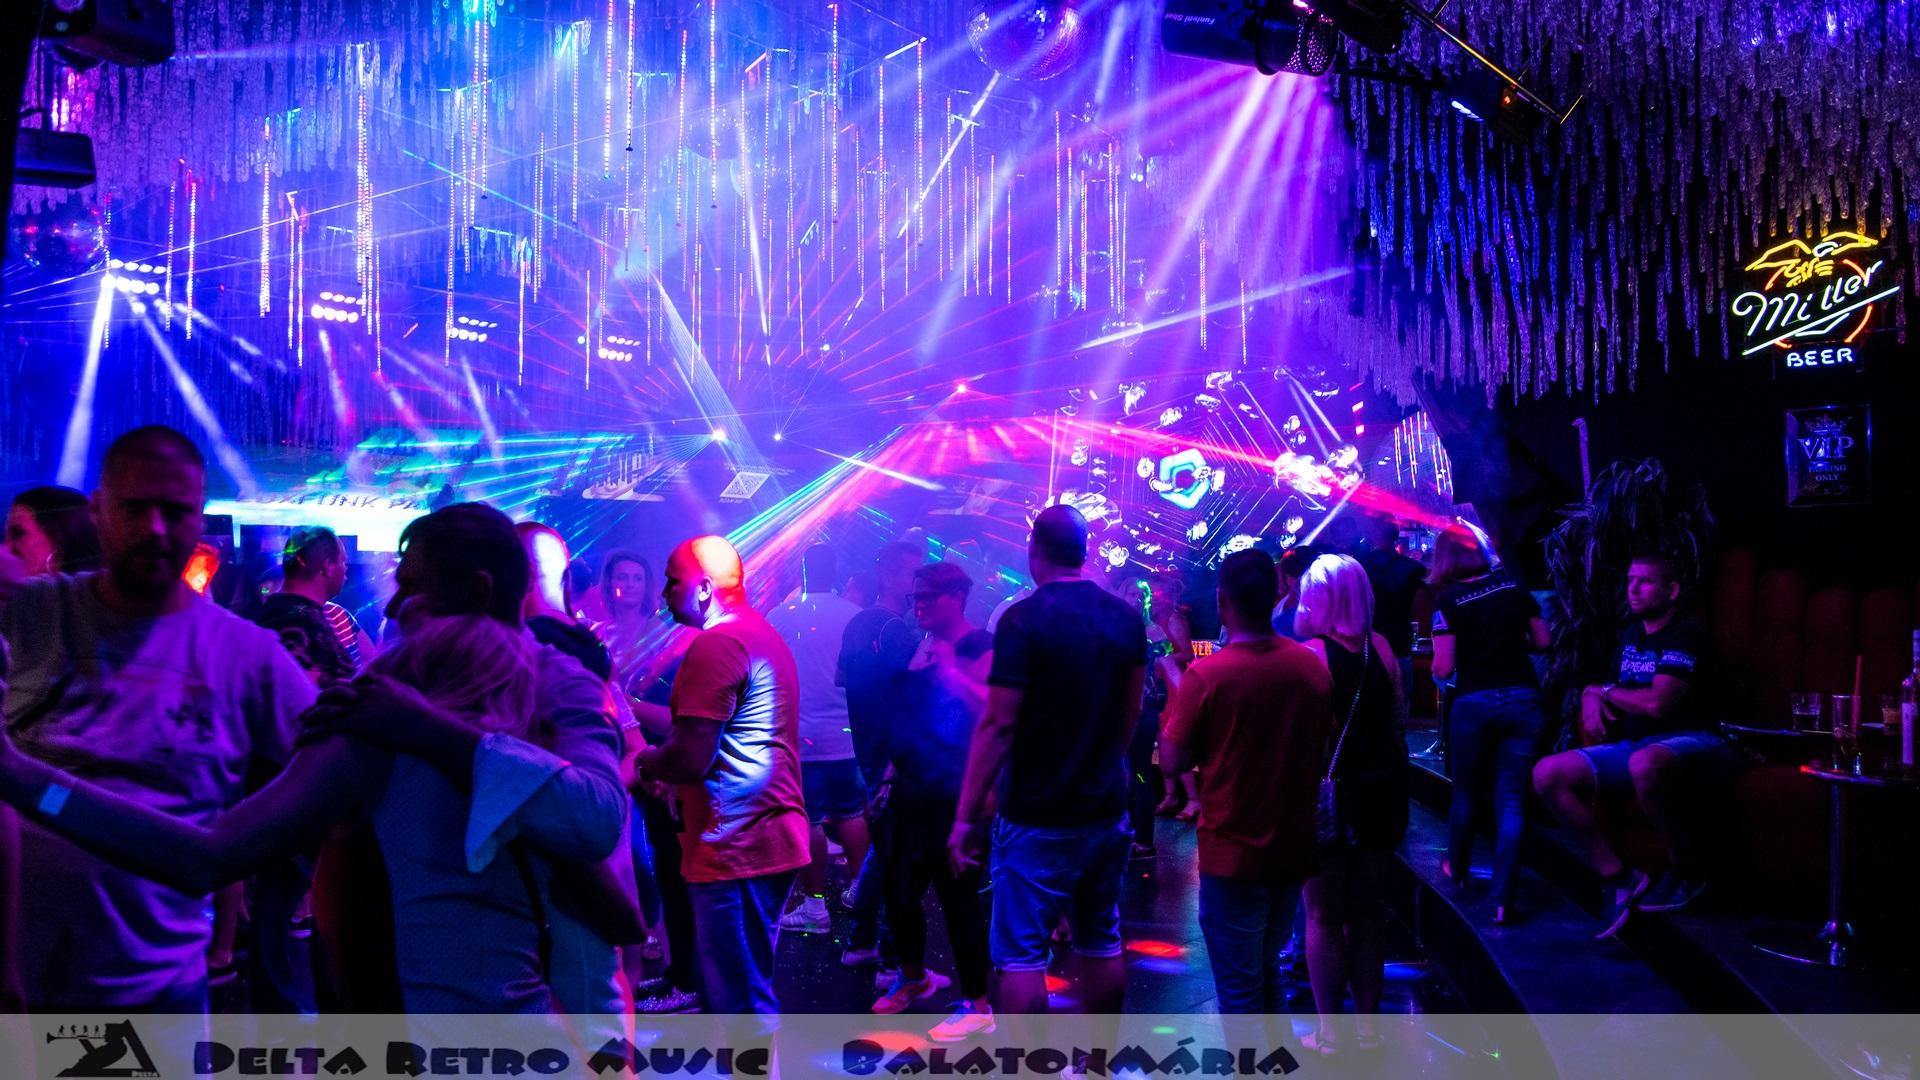 luxfunk-radio-funky-party_200807_delta retro-music-factory_055